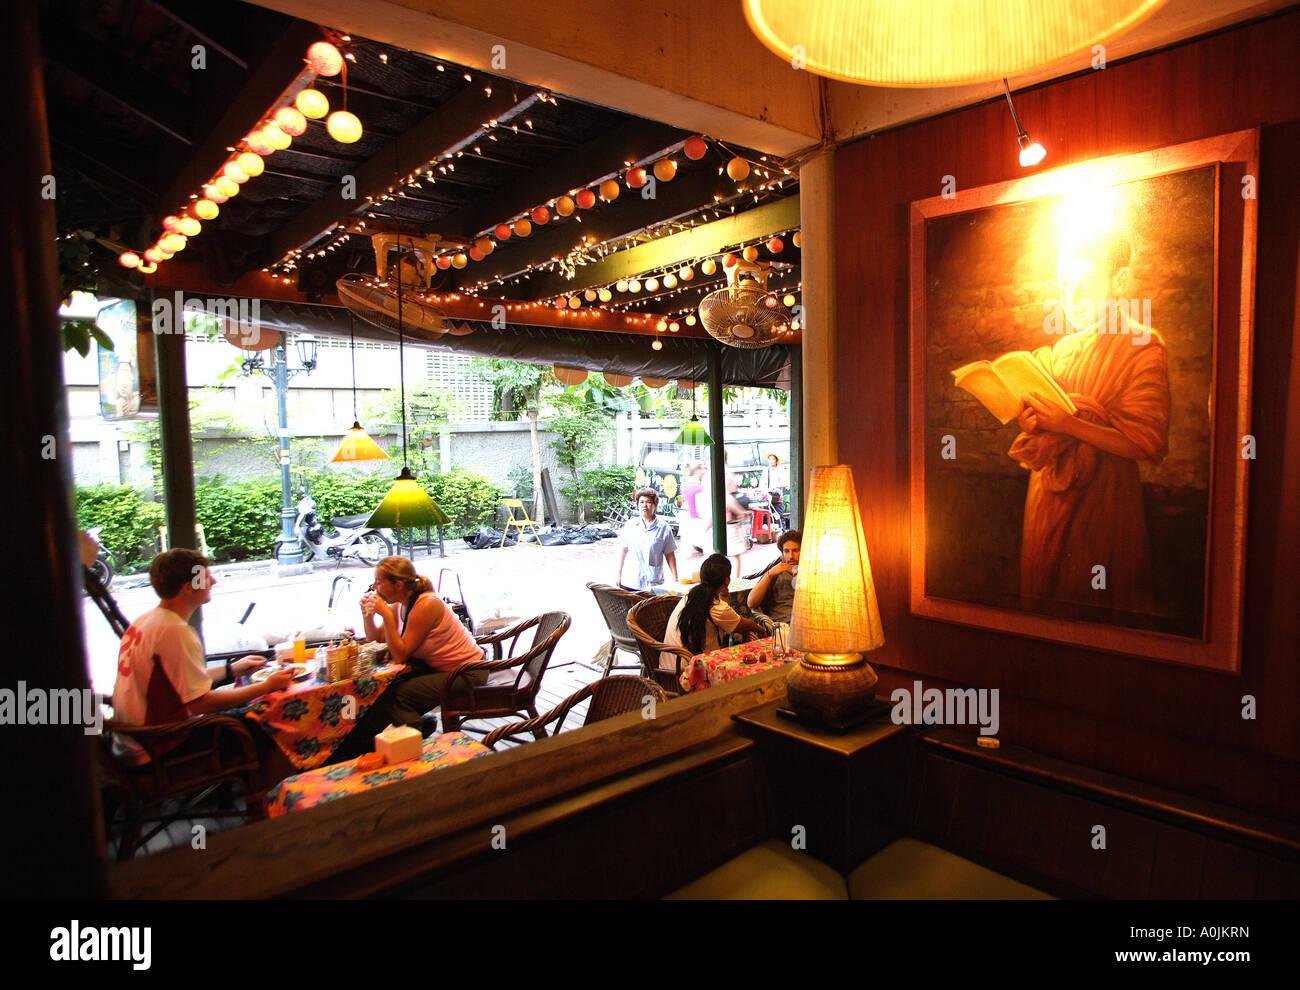 Bars Bangkok Stockfotos & Bars Bangkok Bilder - Seite 6 - Alamy